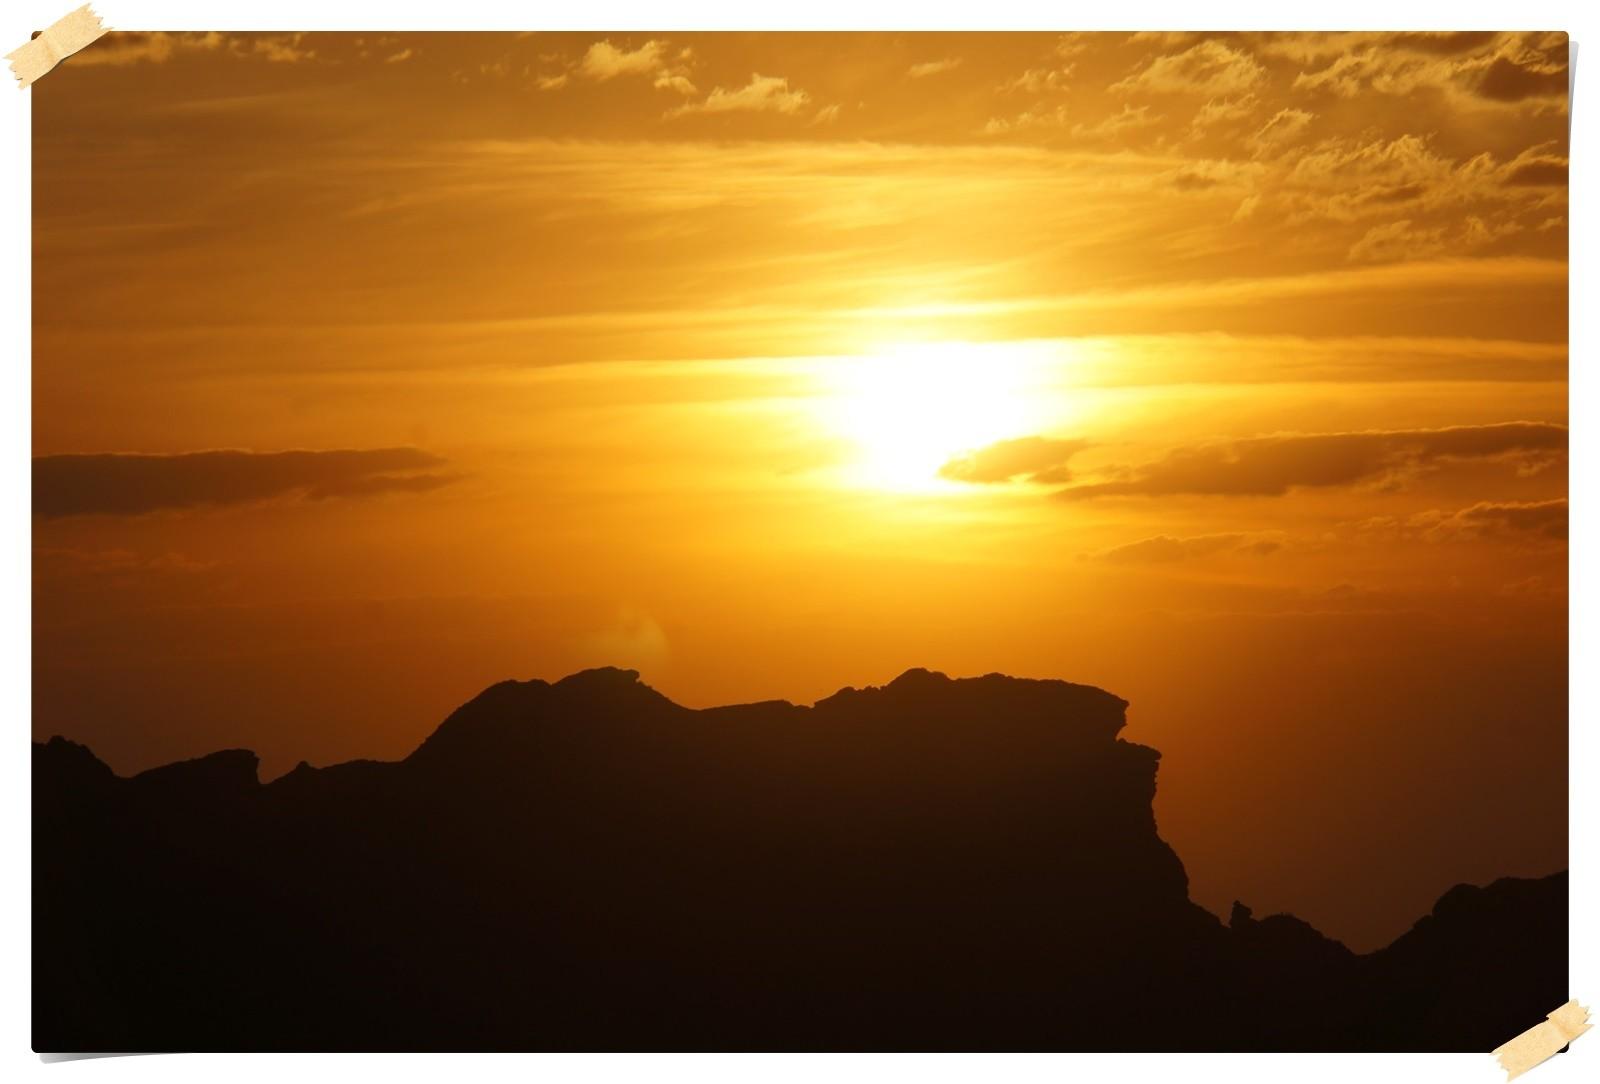 Sonnenuntergang in der Sierra